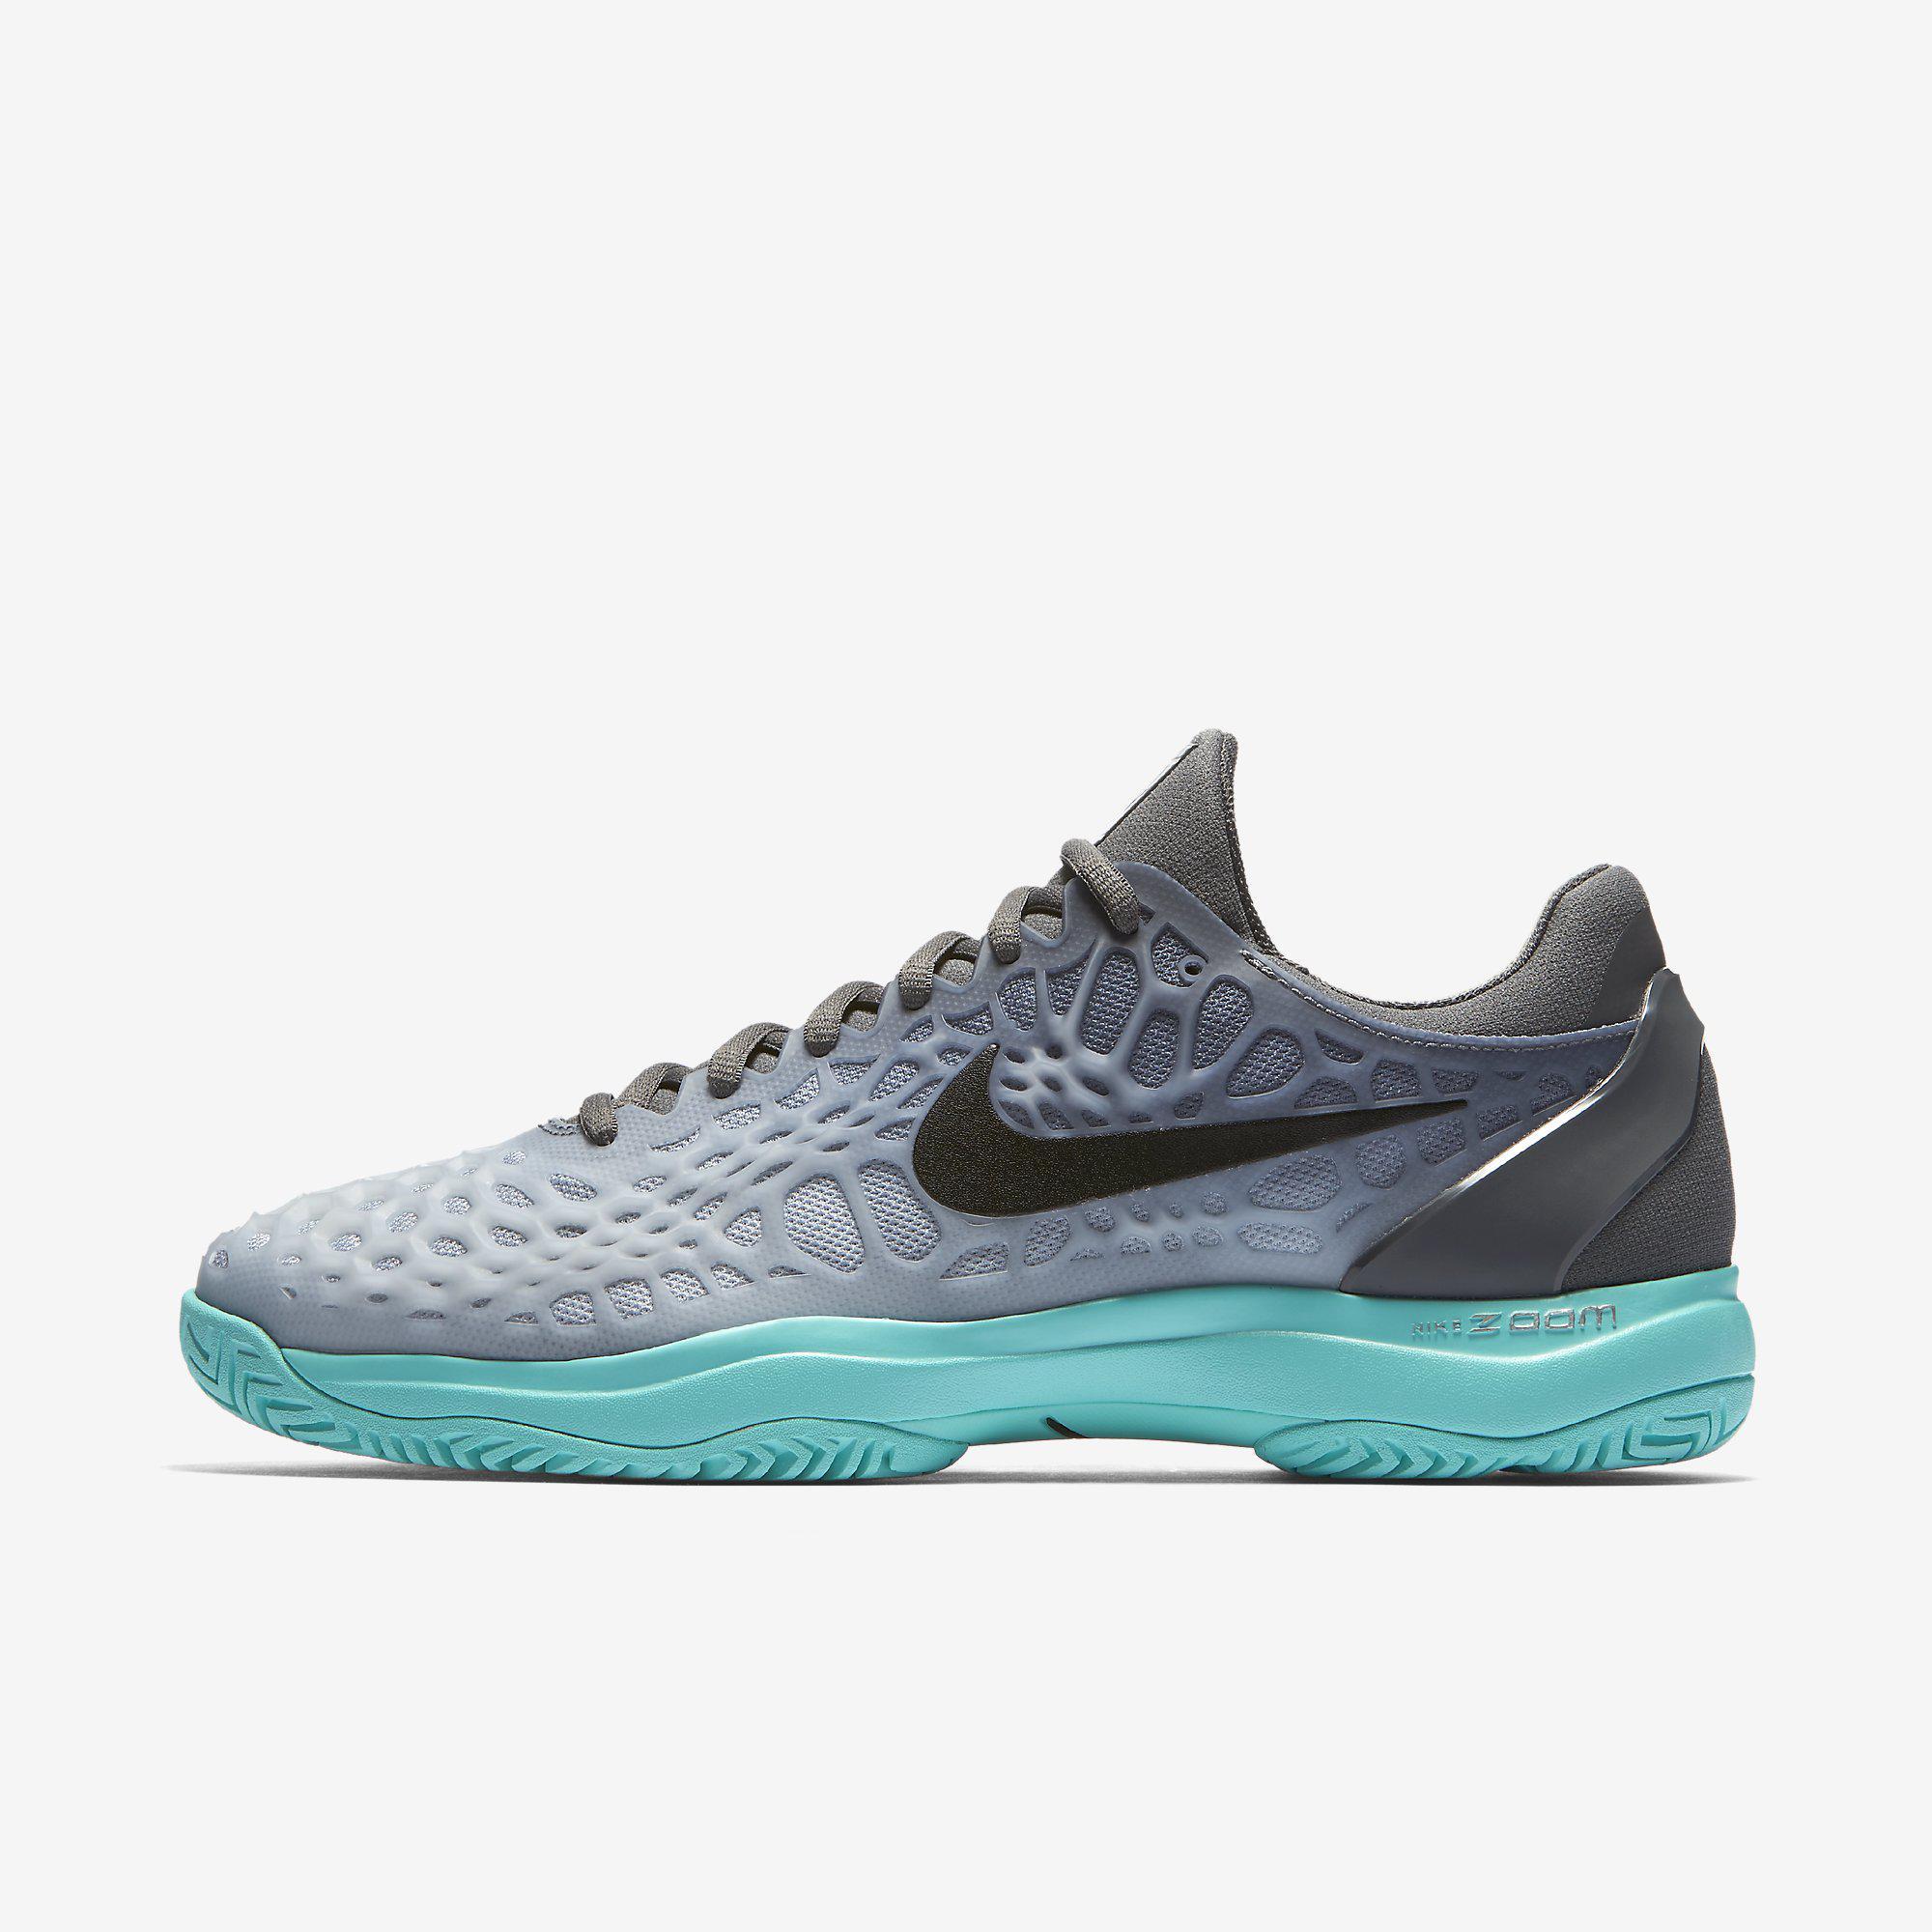 a668966526e Nike Mens Zoom Cage 3 Tennis Shoes - Wolf Grey Aurora - Tennisnuts.com